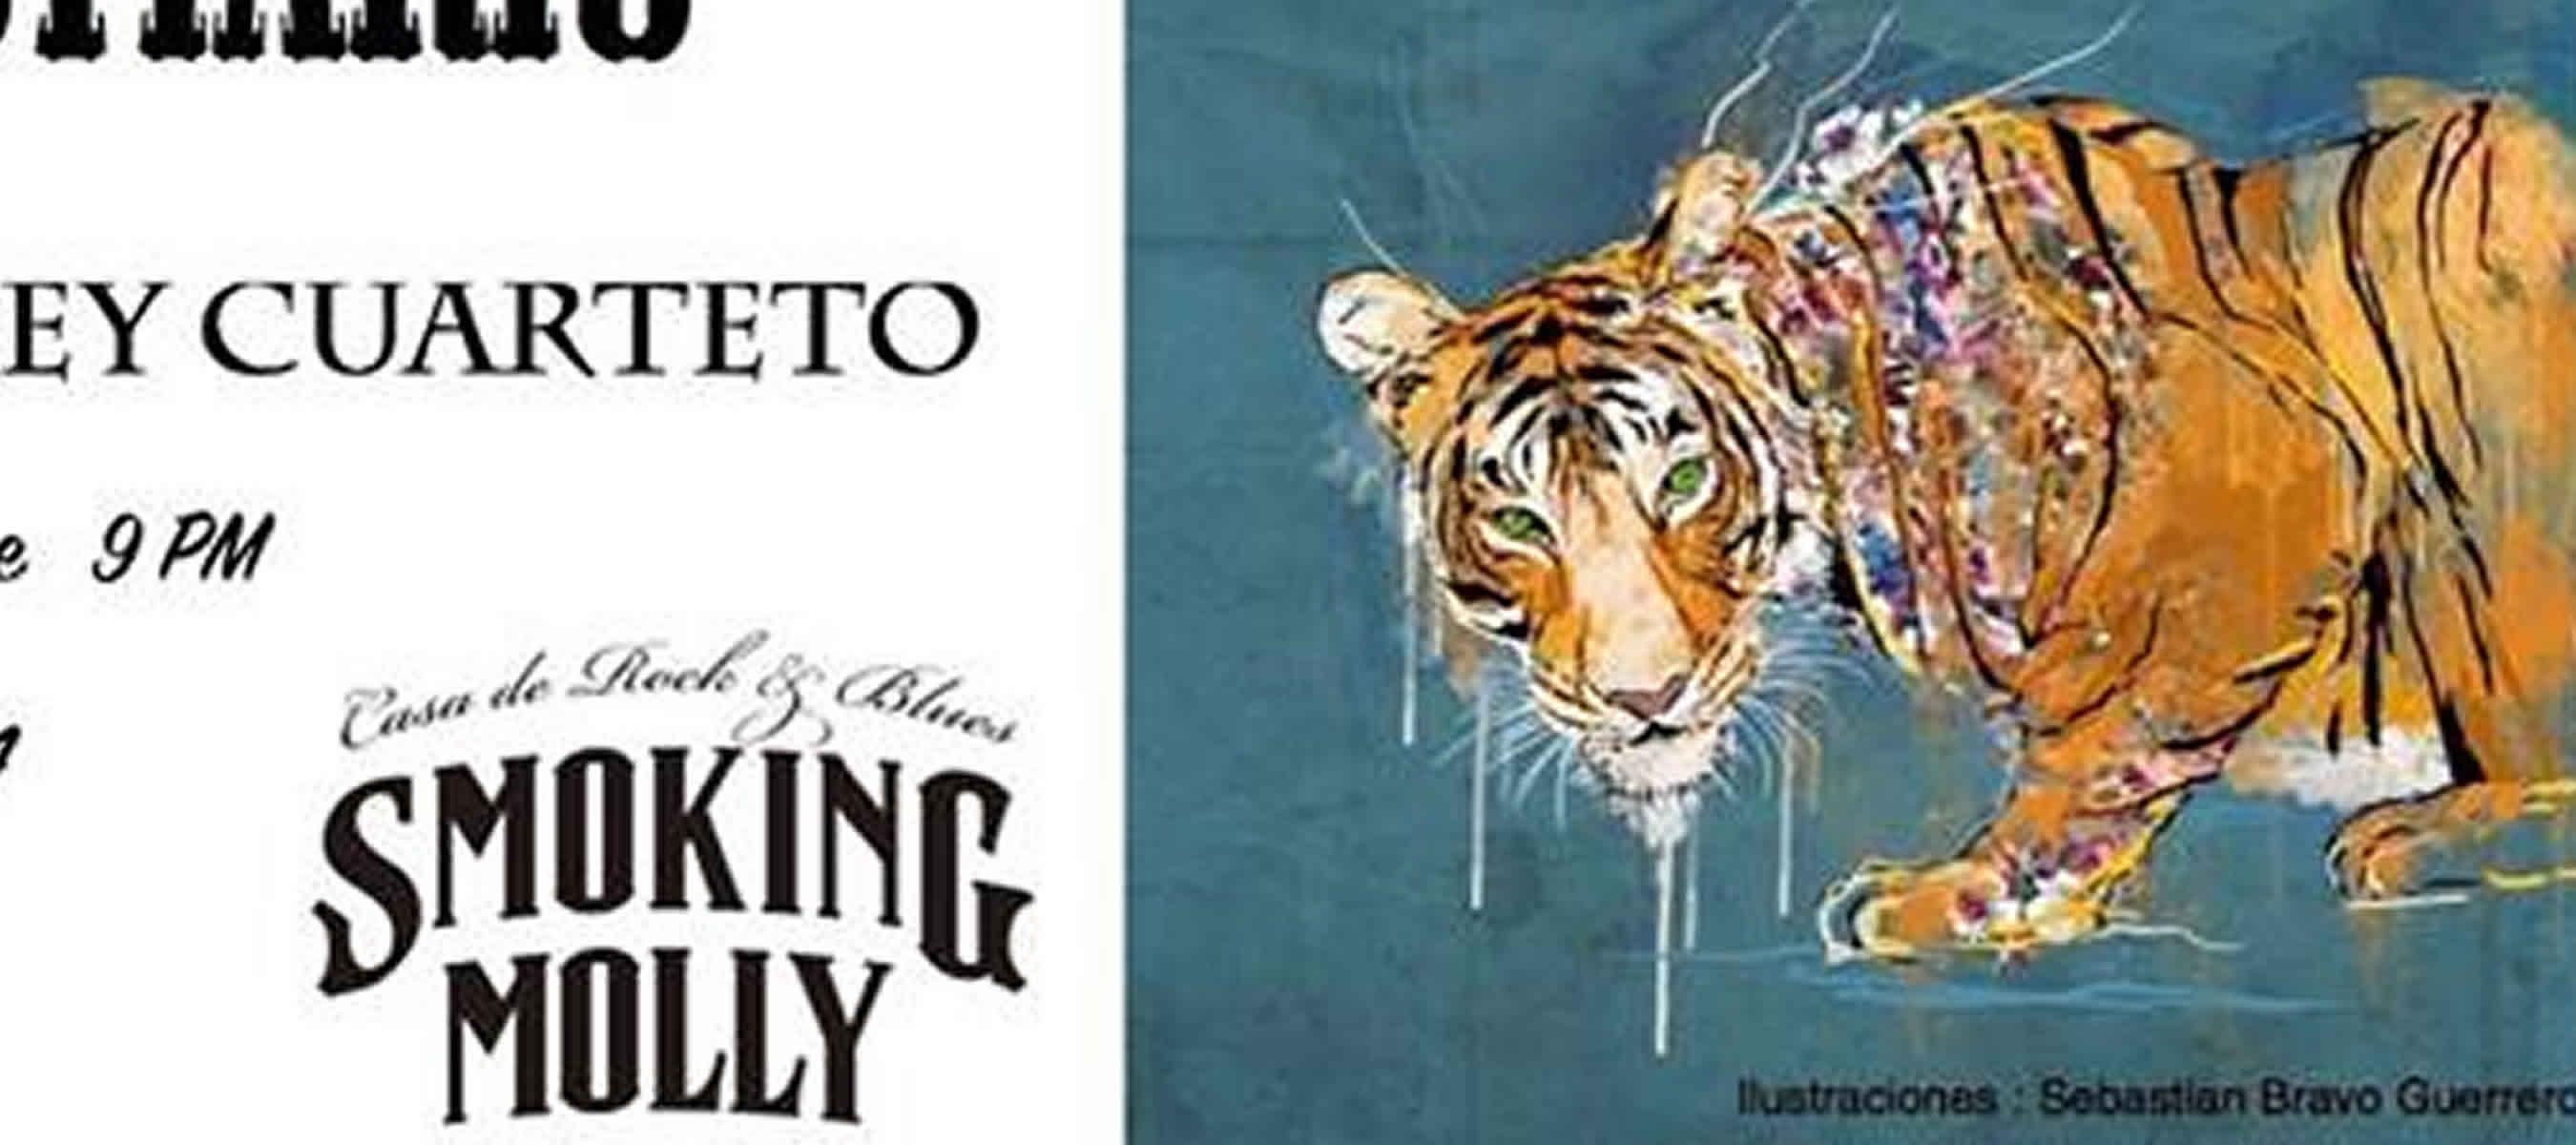 Felipe rey jazz - Smoking Molly